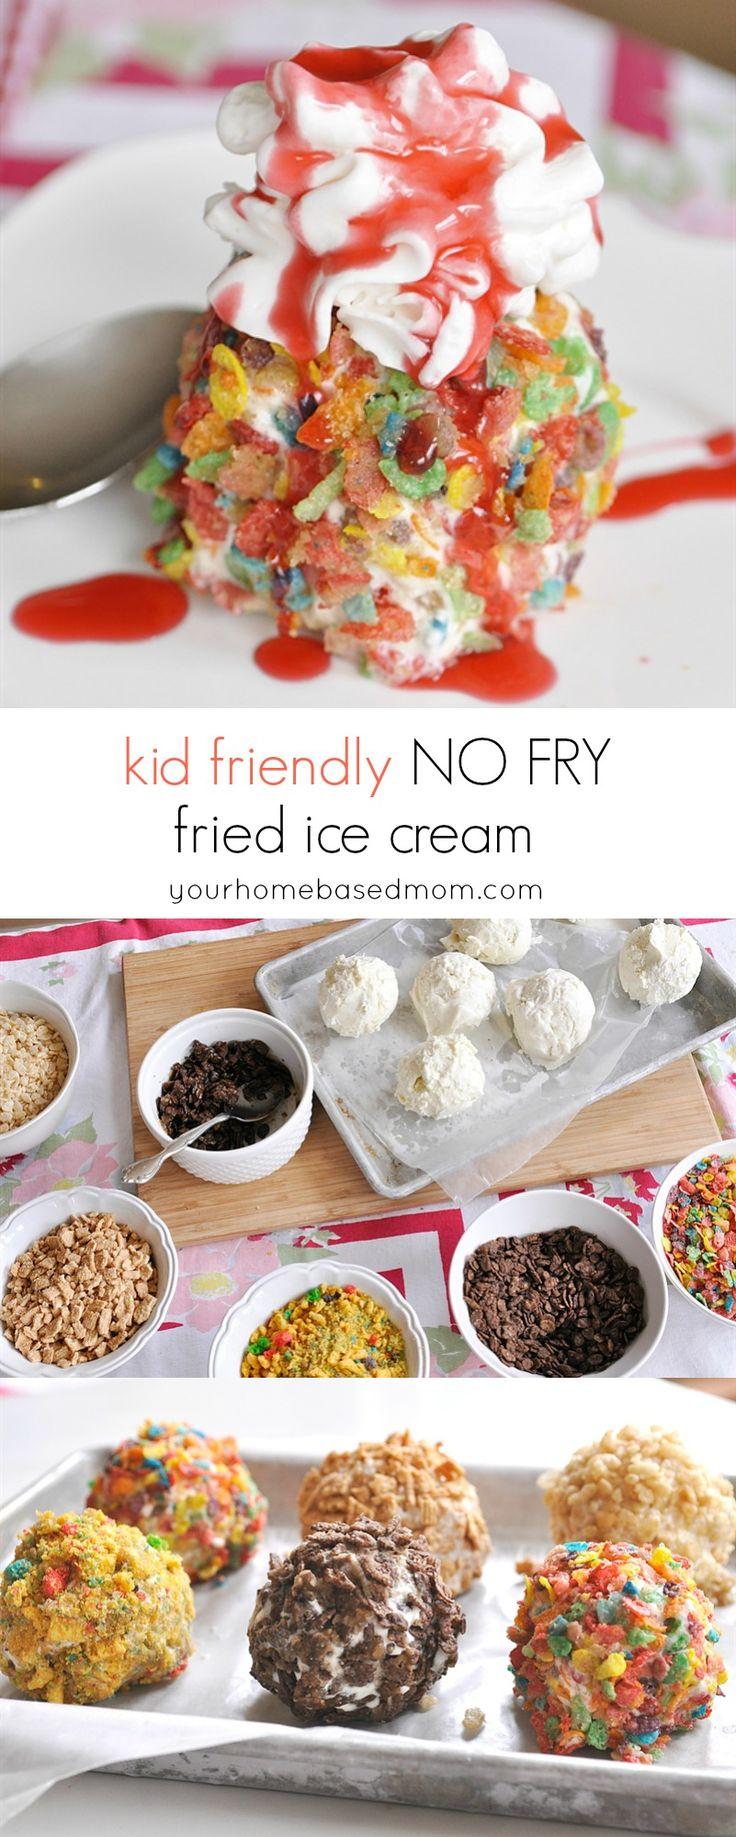 Kid Friendly No Fry Fried Ice Cream